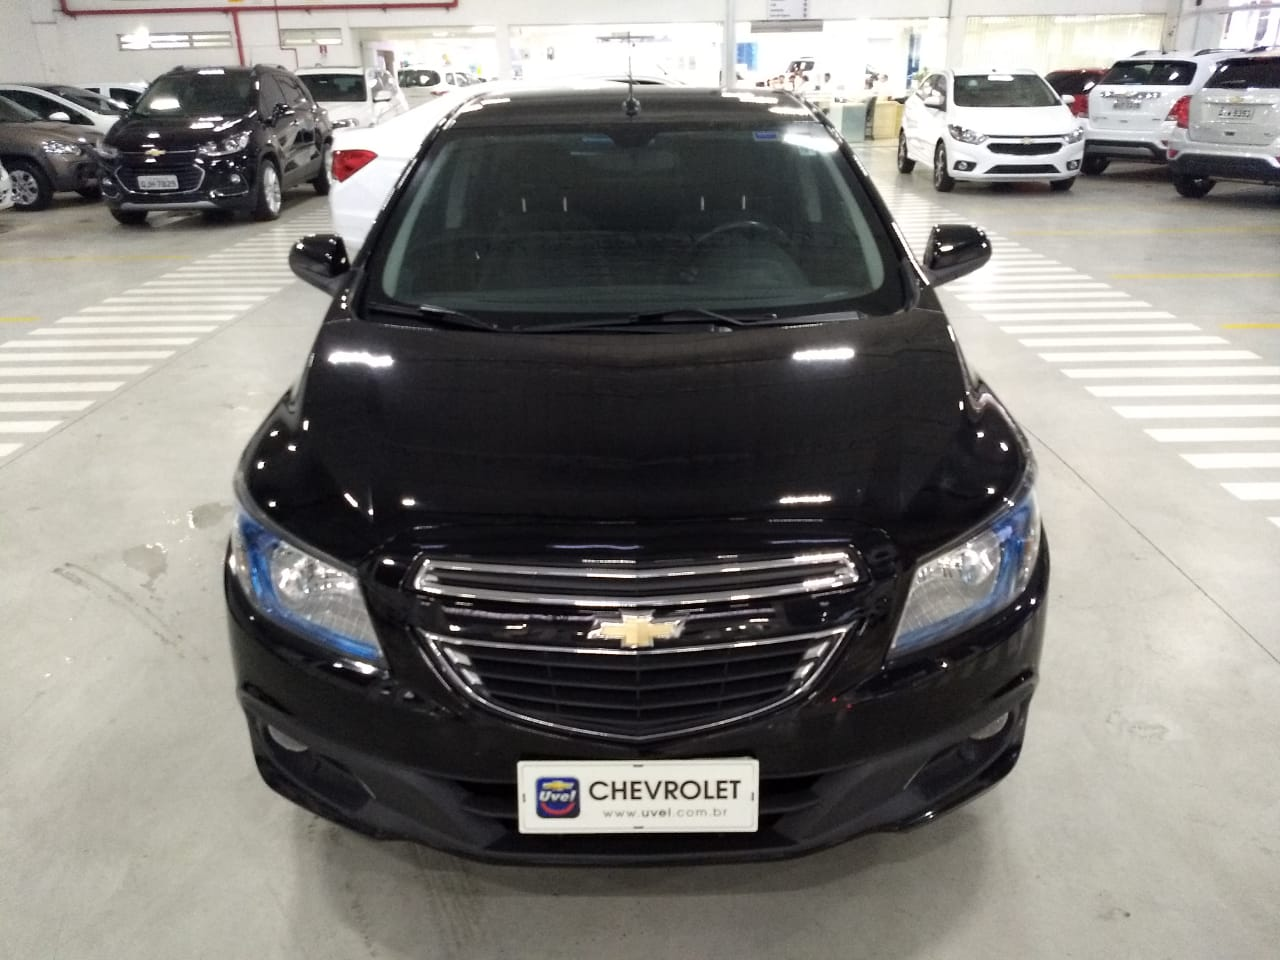 Chevrolet Prisma LTZ 1.4L 2015